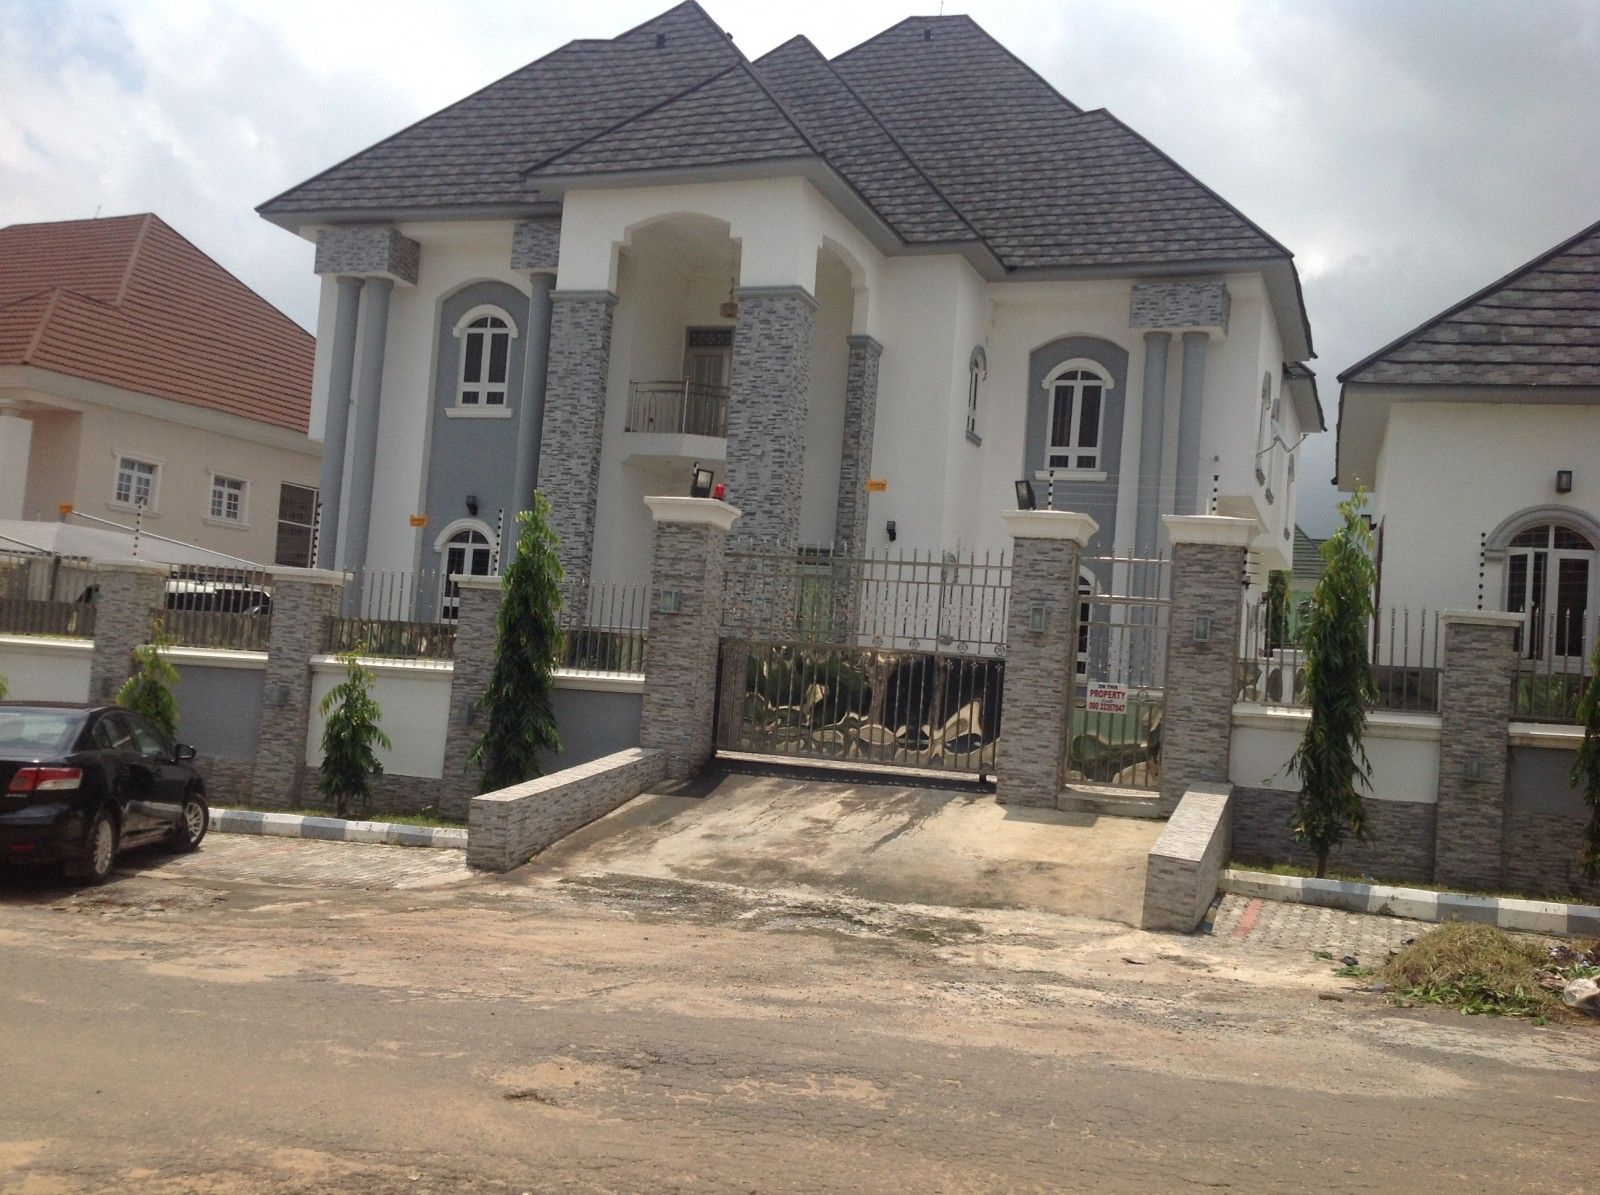 6 Bedroom Detached Duplex At Gwarinpa Abuja For Sale Detached Hou Casas Casitas Fachadas